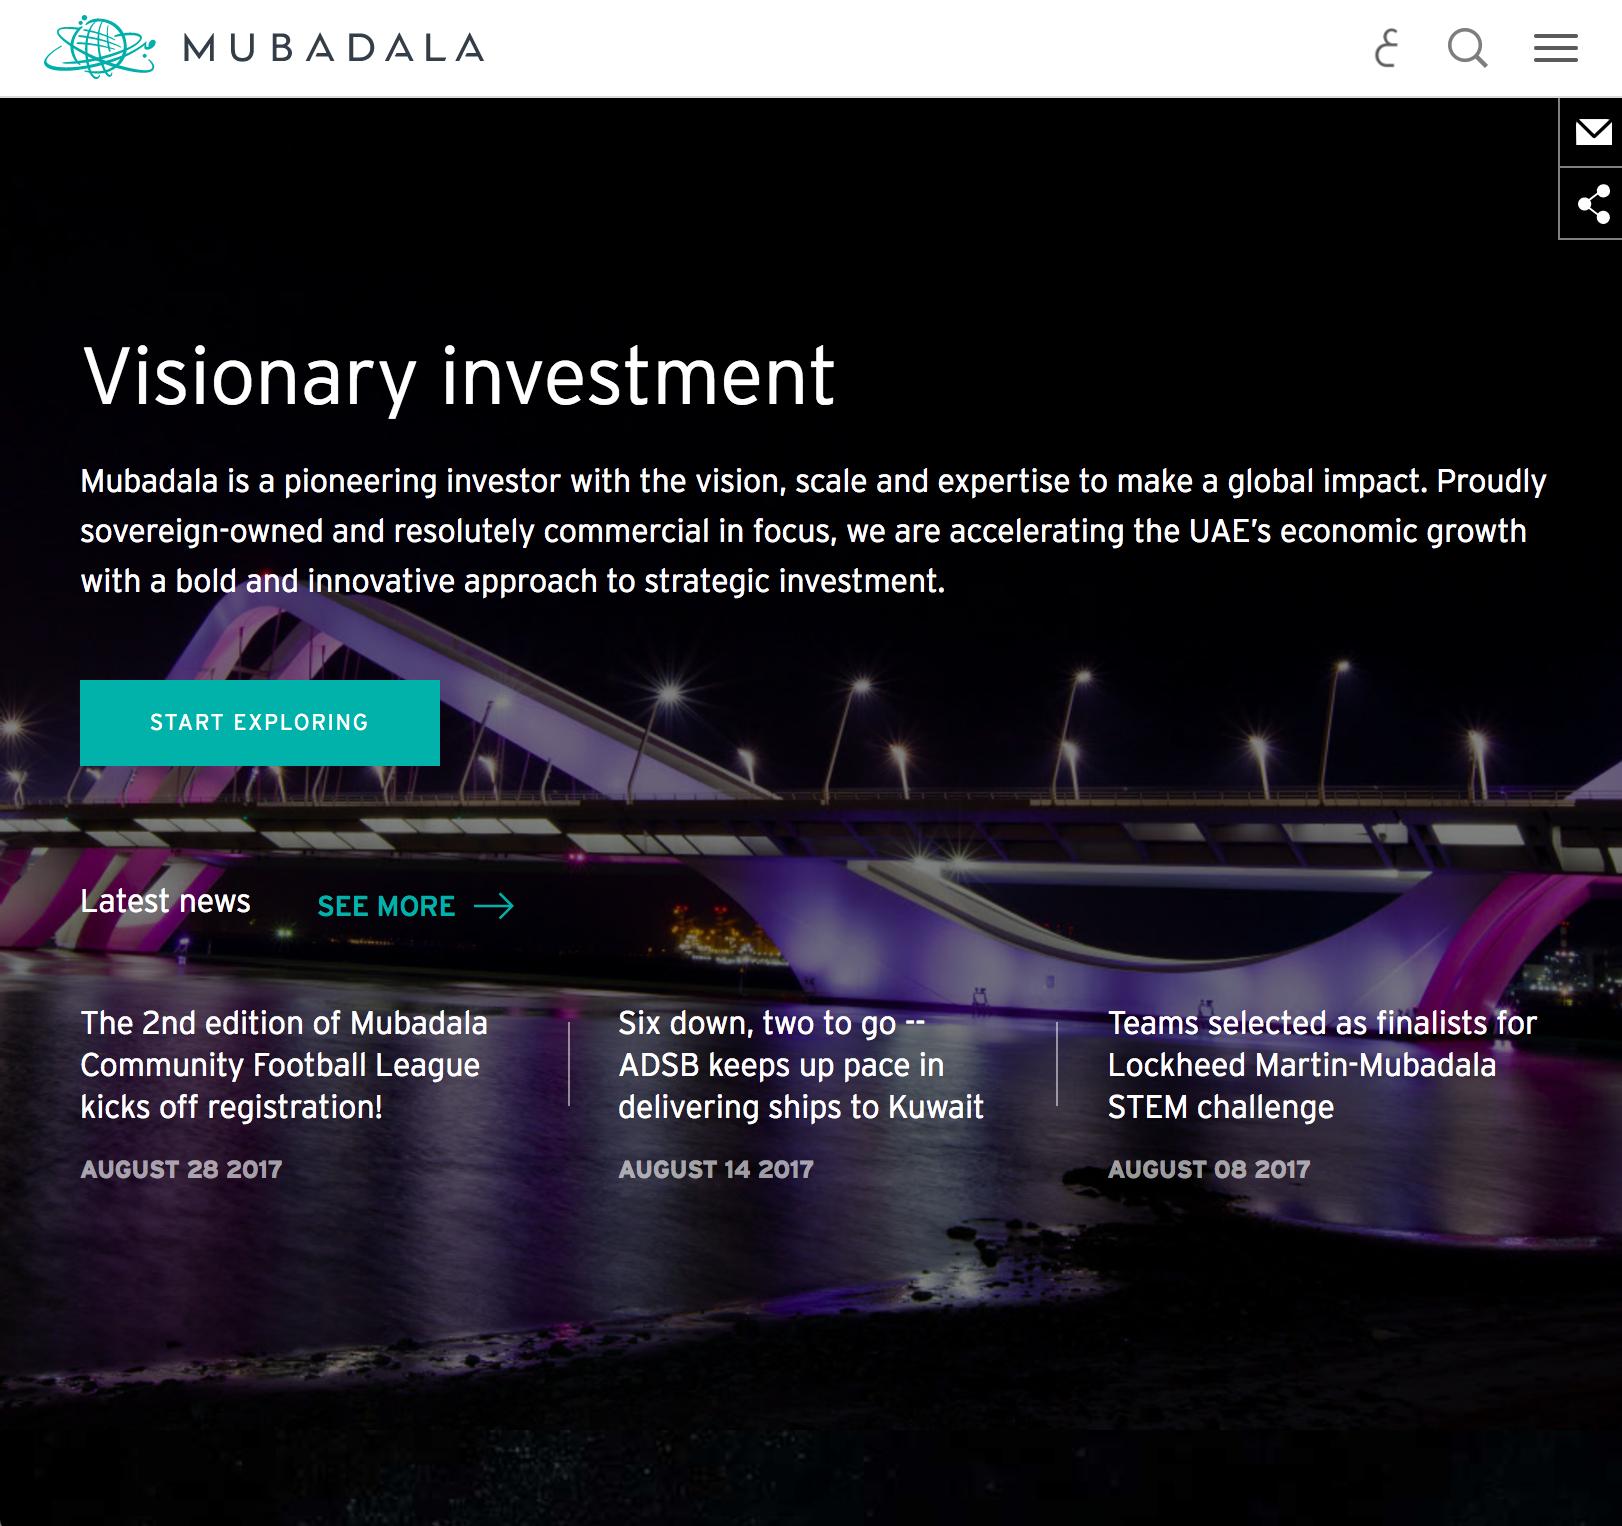 Mubadala Corporate Website image